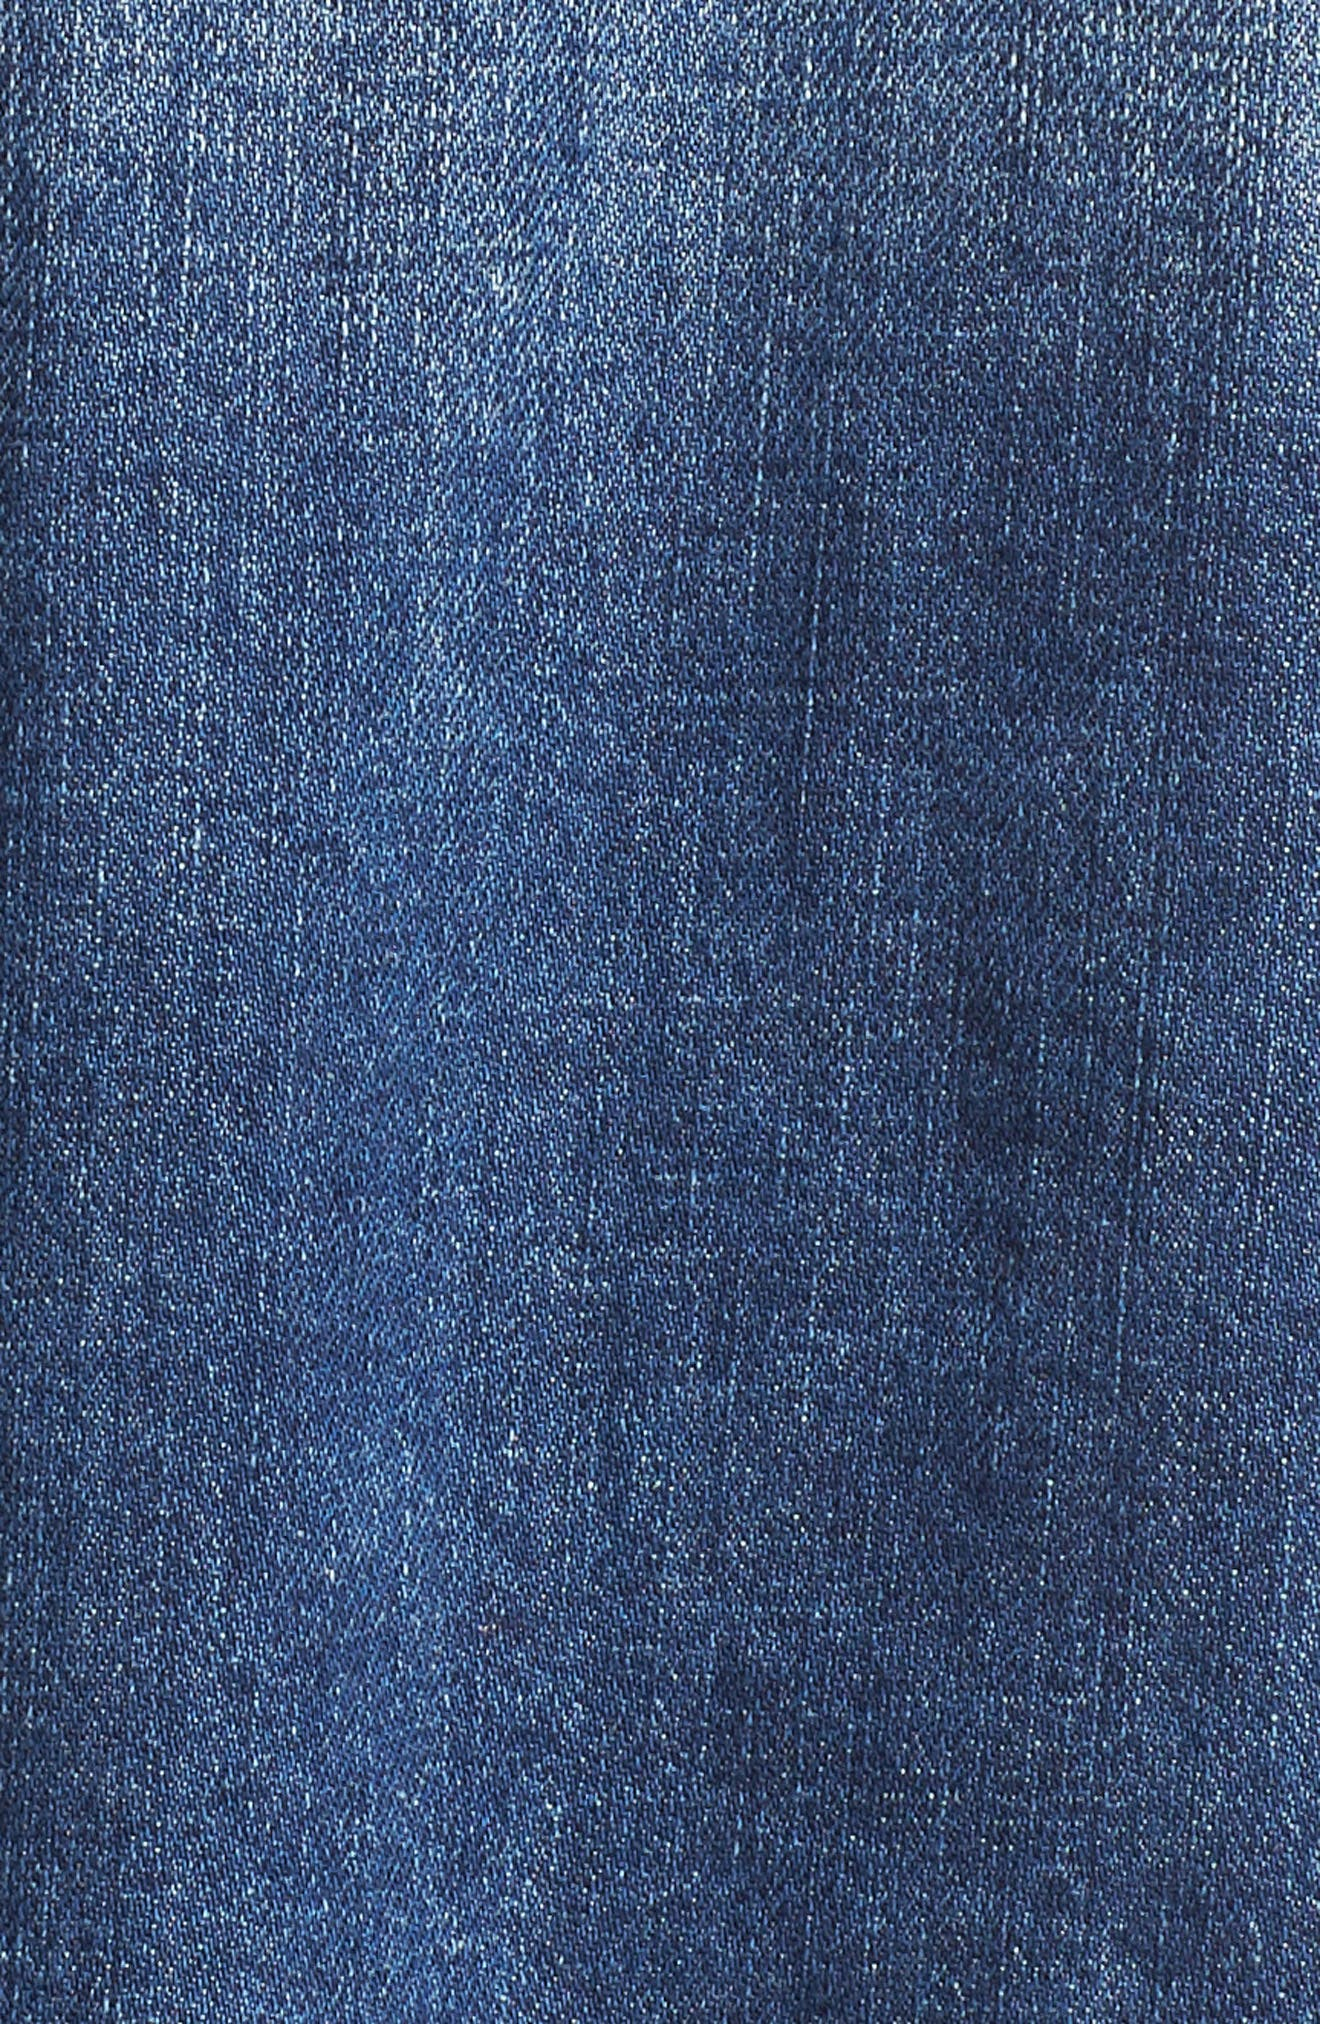 Oversize Colorblock Denim Jacket,                             Alternate thumbnail 7, color,                             400